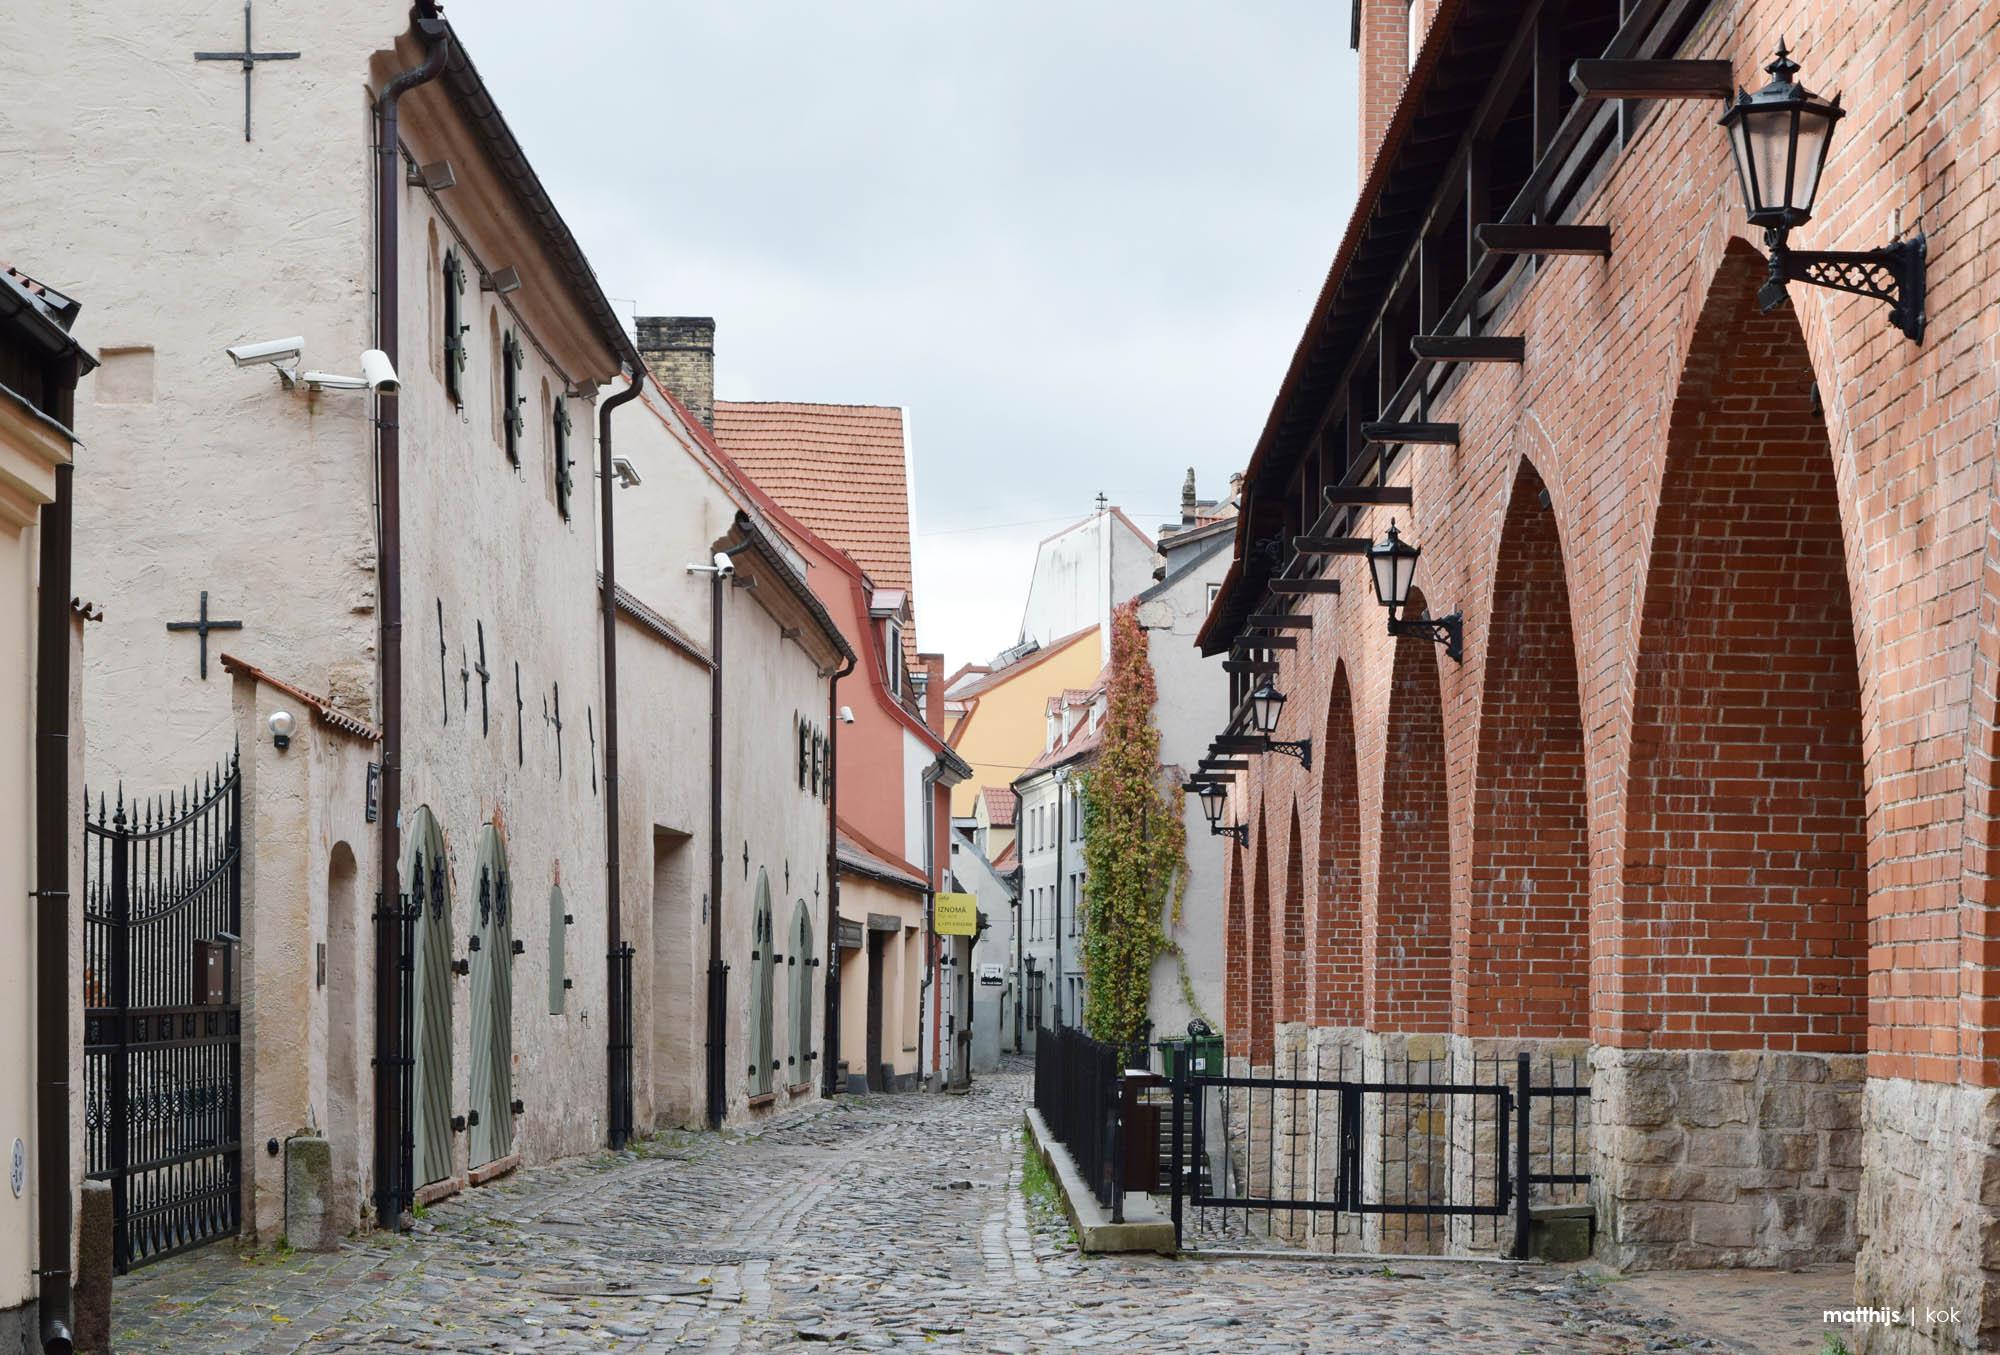 Cobblestone Streets of Riga Old Town, Latvia   Photo by Matthijs Kok